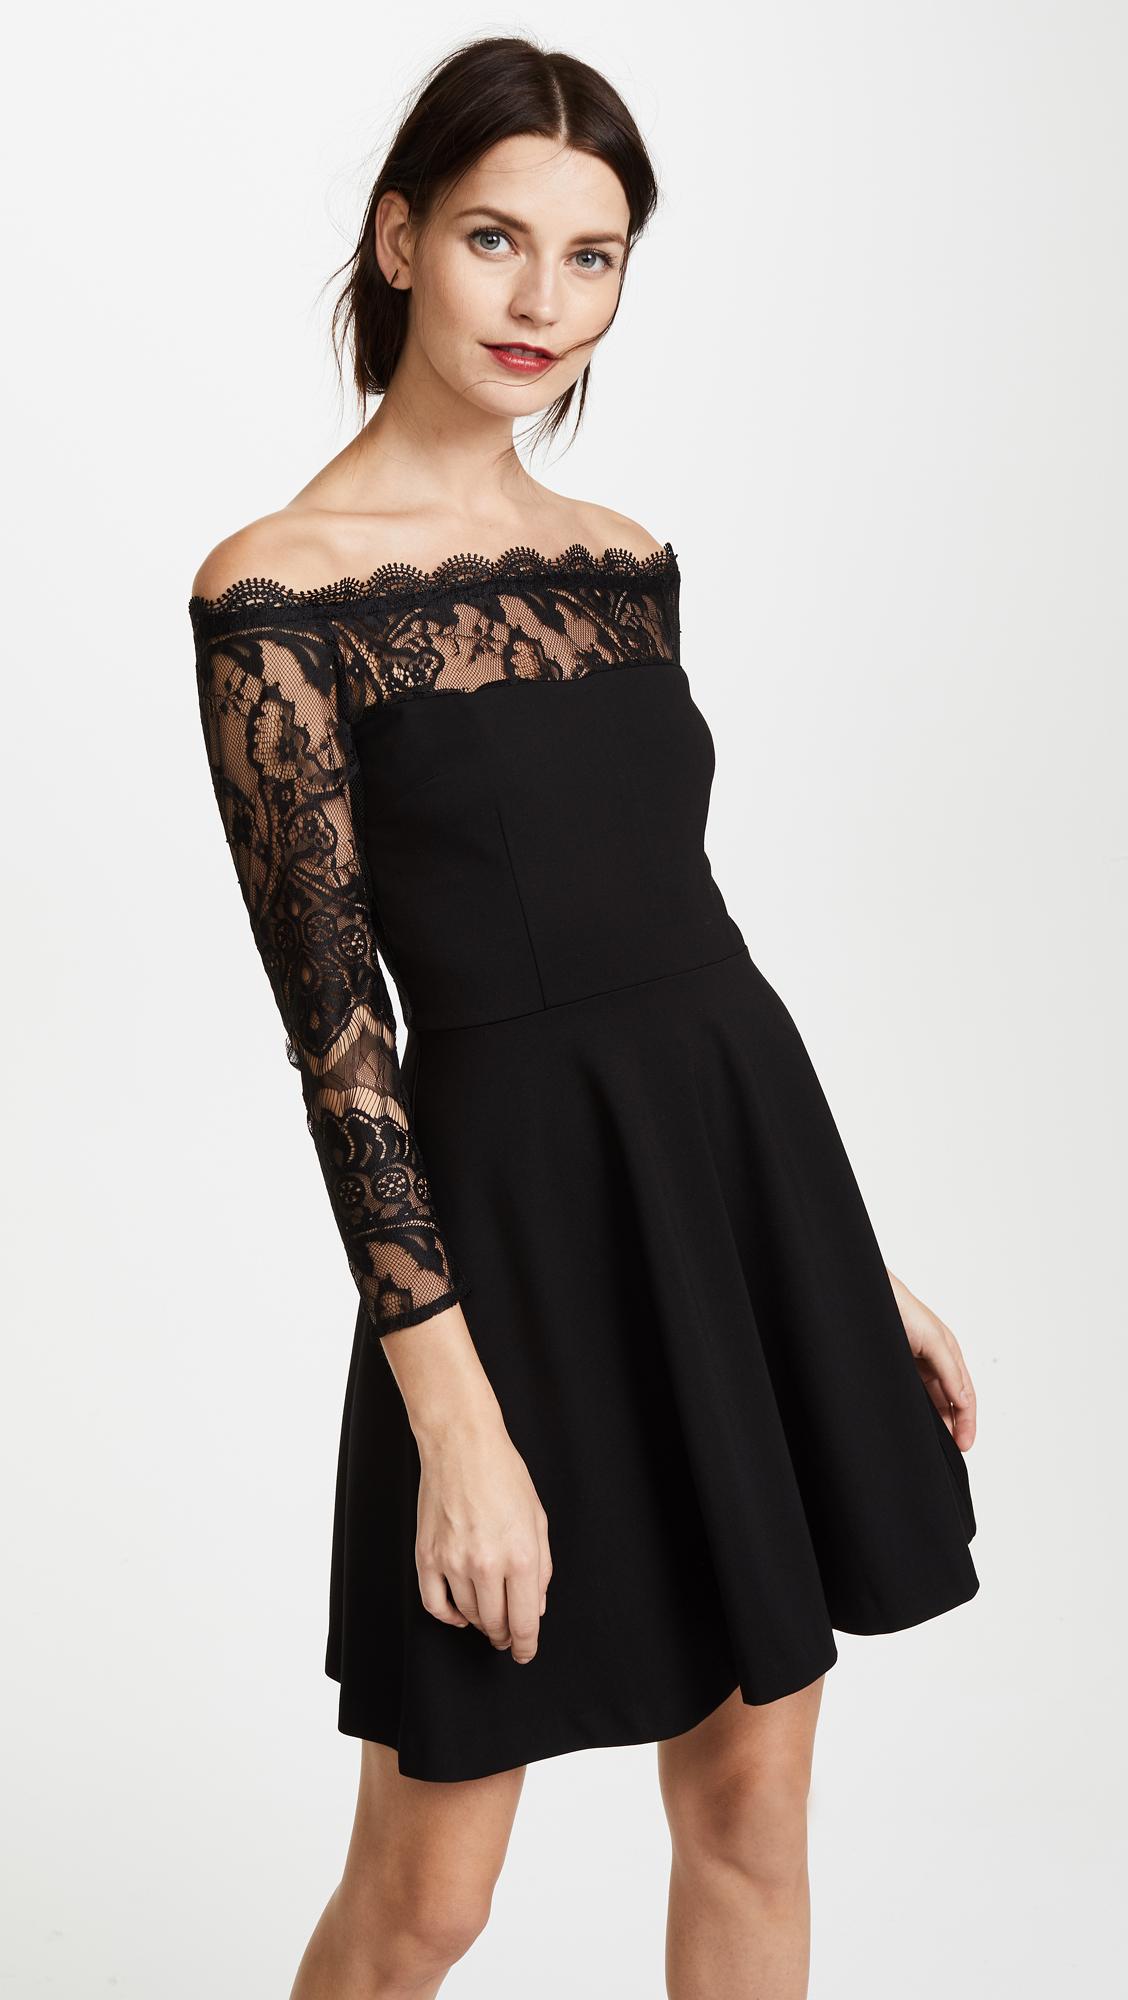 My black mini dress eng sub online